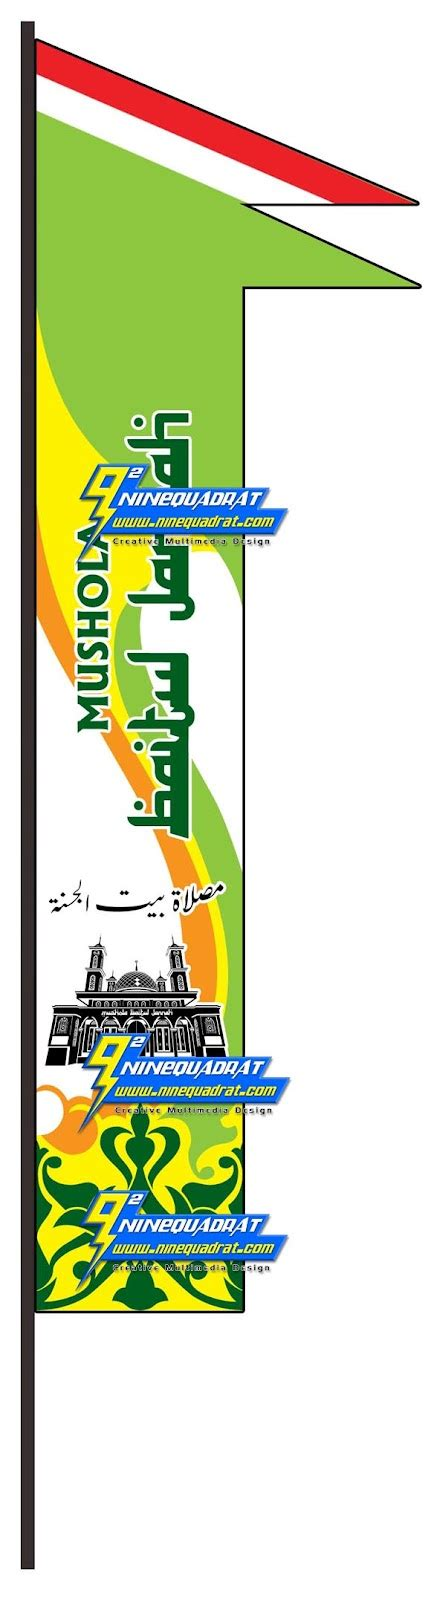 ninequadrat cetak umbul umbul spanduk bendera mushola